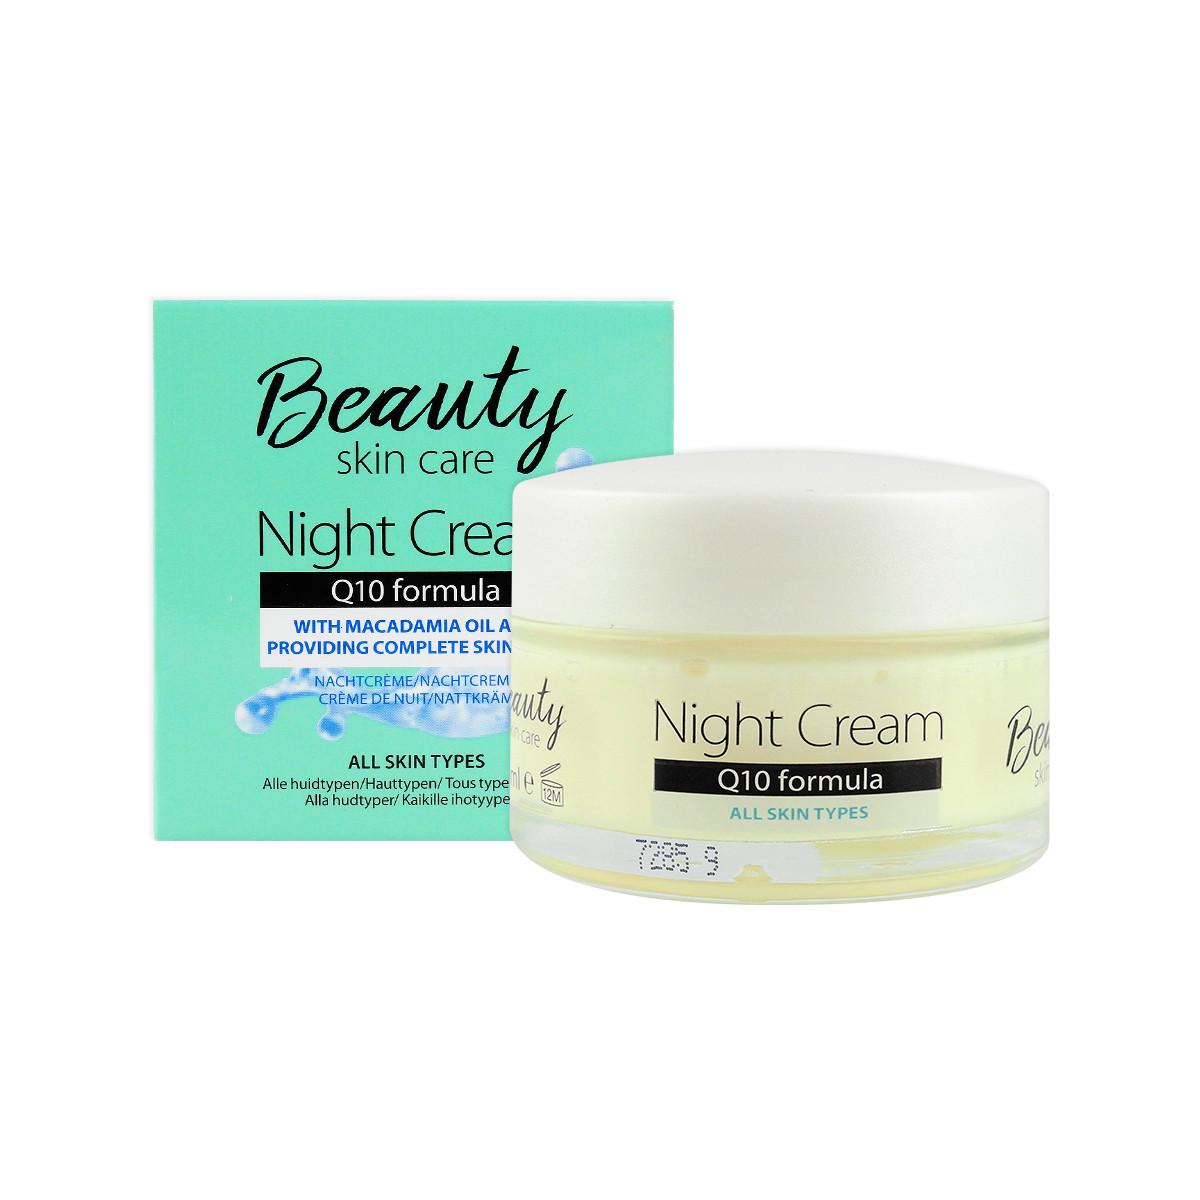 image of 歐洲 Beauty Skin Care Q10緊實活膚晚霜50ml     Europe Beauty Skin Care Night Cream Q10 Formula 50ml